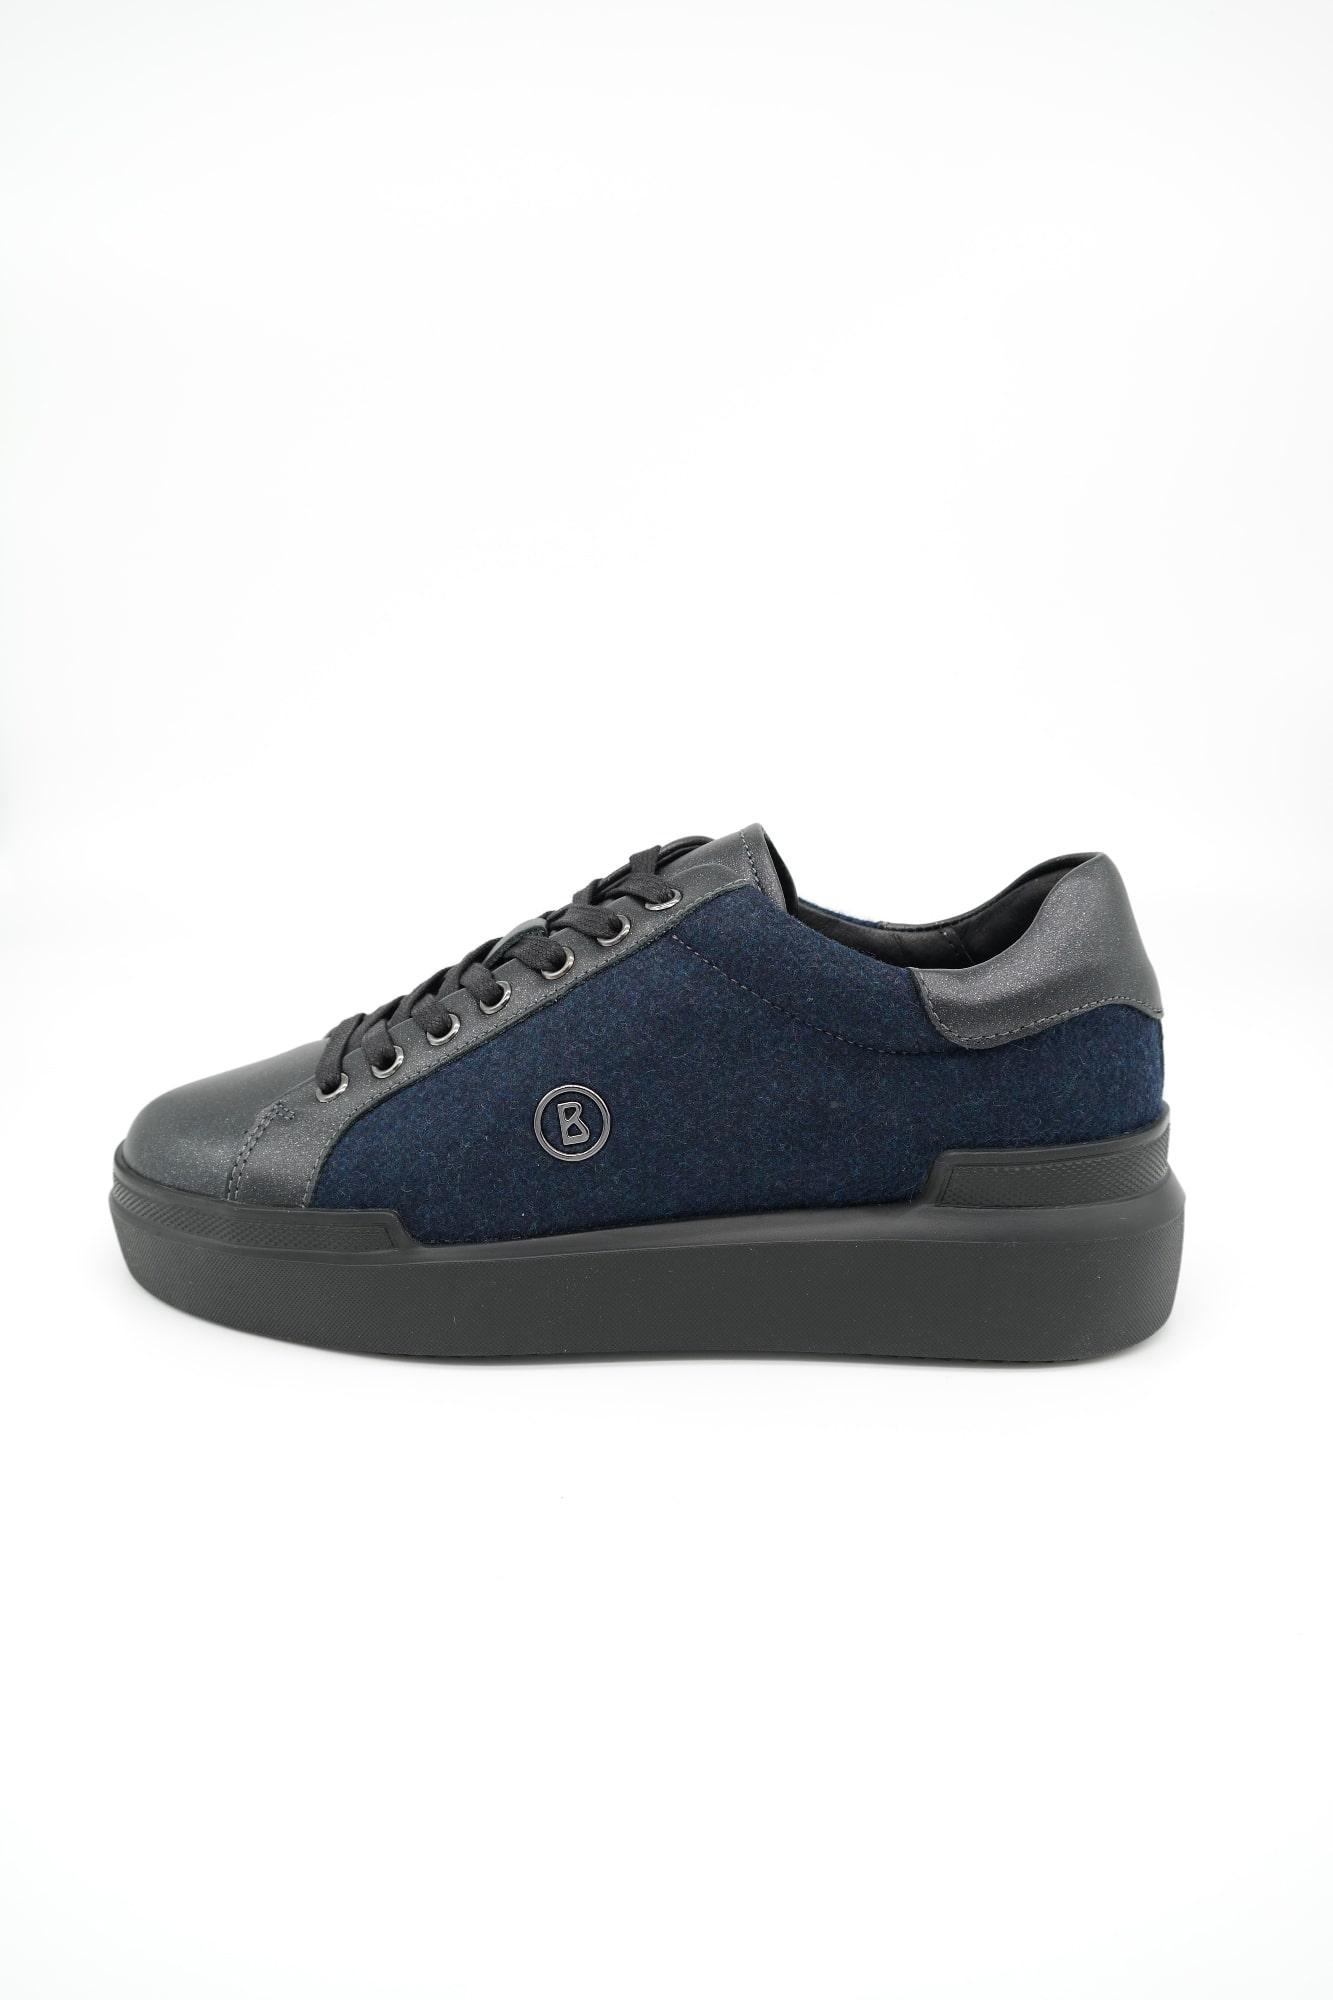 BOGNER Damen Schuhe Low Sneaker Hollywood 12 Schwarz Leder-Filz-Mix